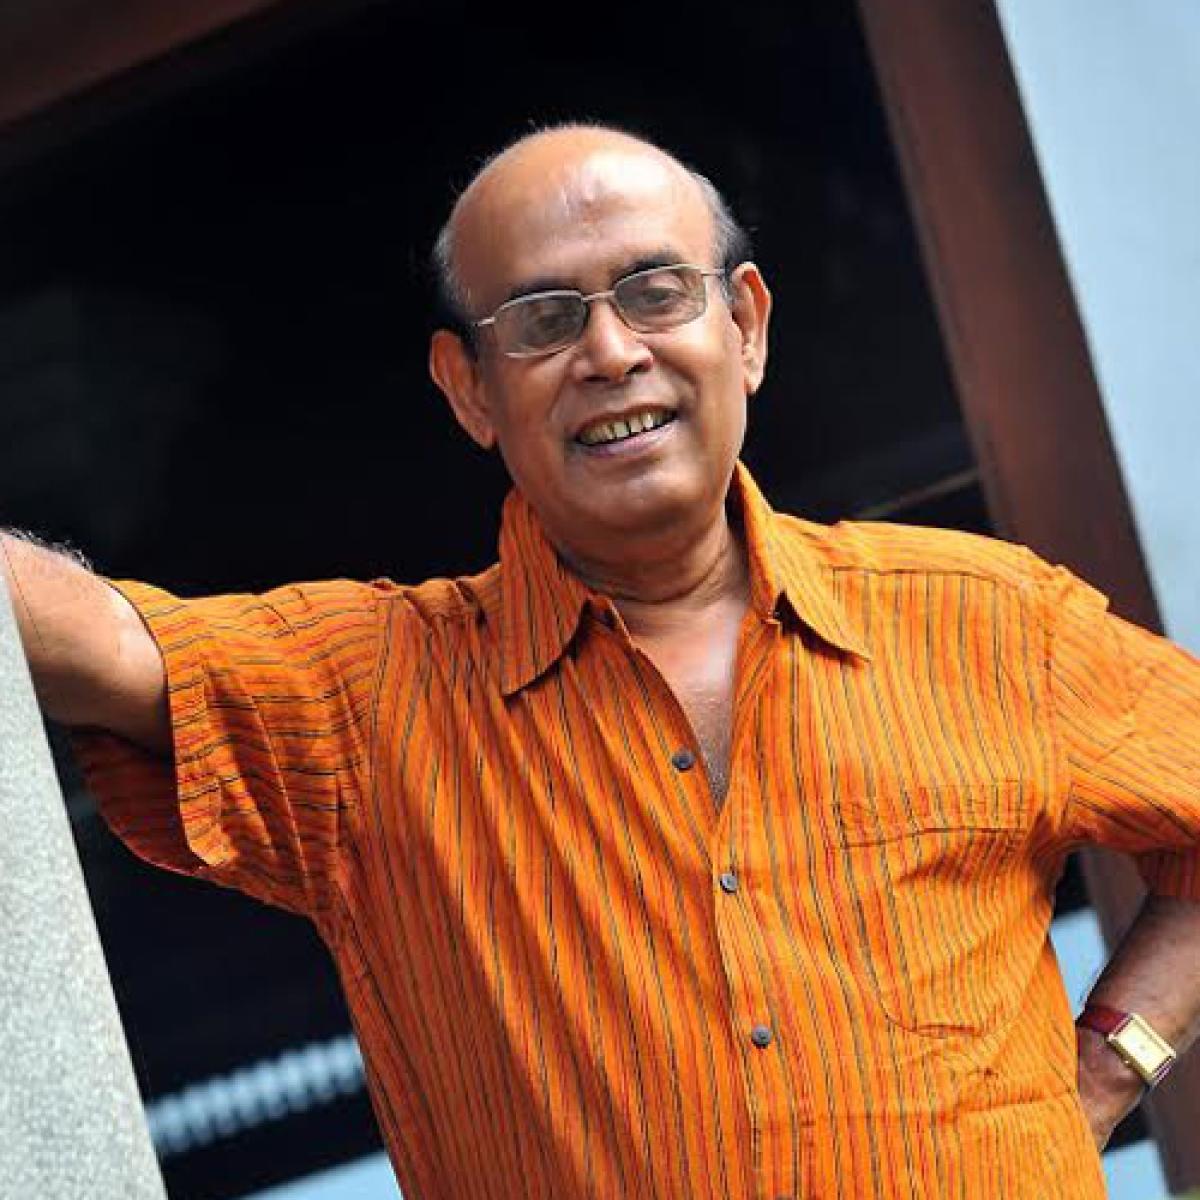 National award-winning Bengali film director Buddhadeb Dasgupta passes away at 77